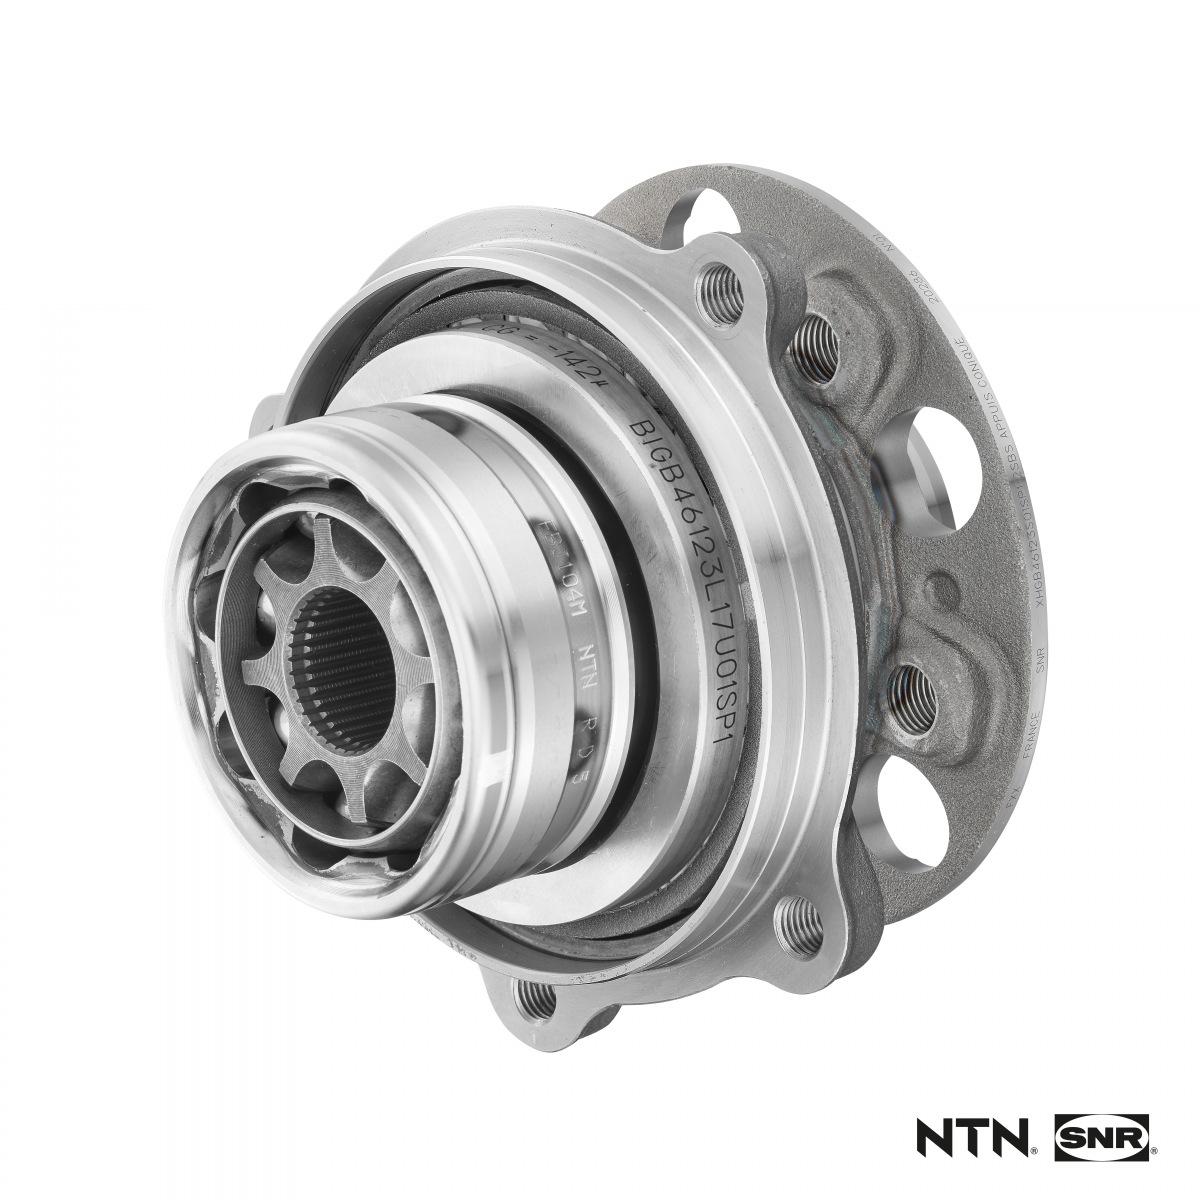 NTN-SNR ložisko nové generace